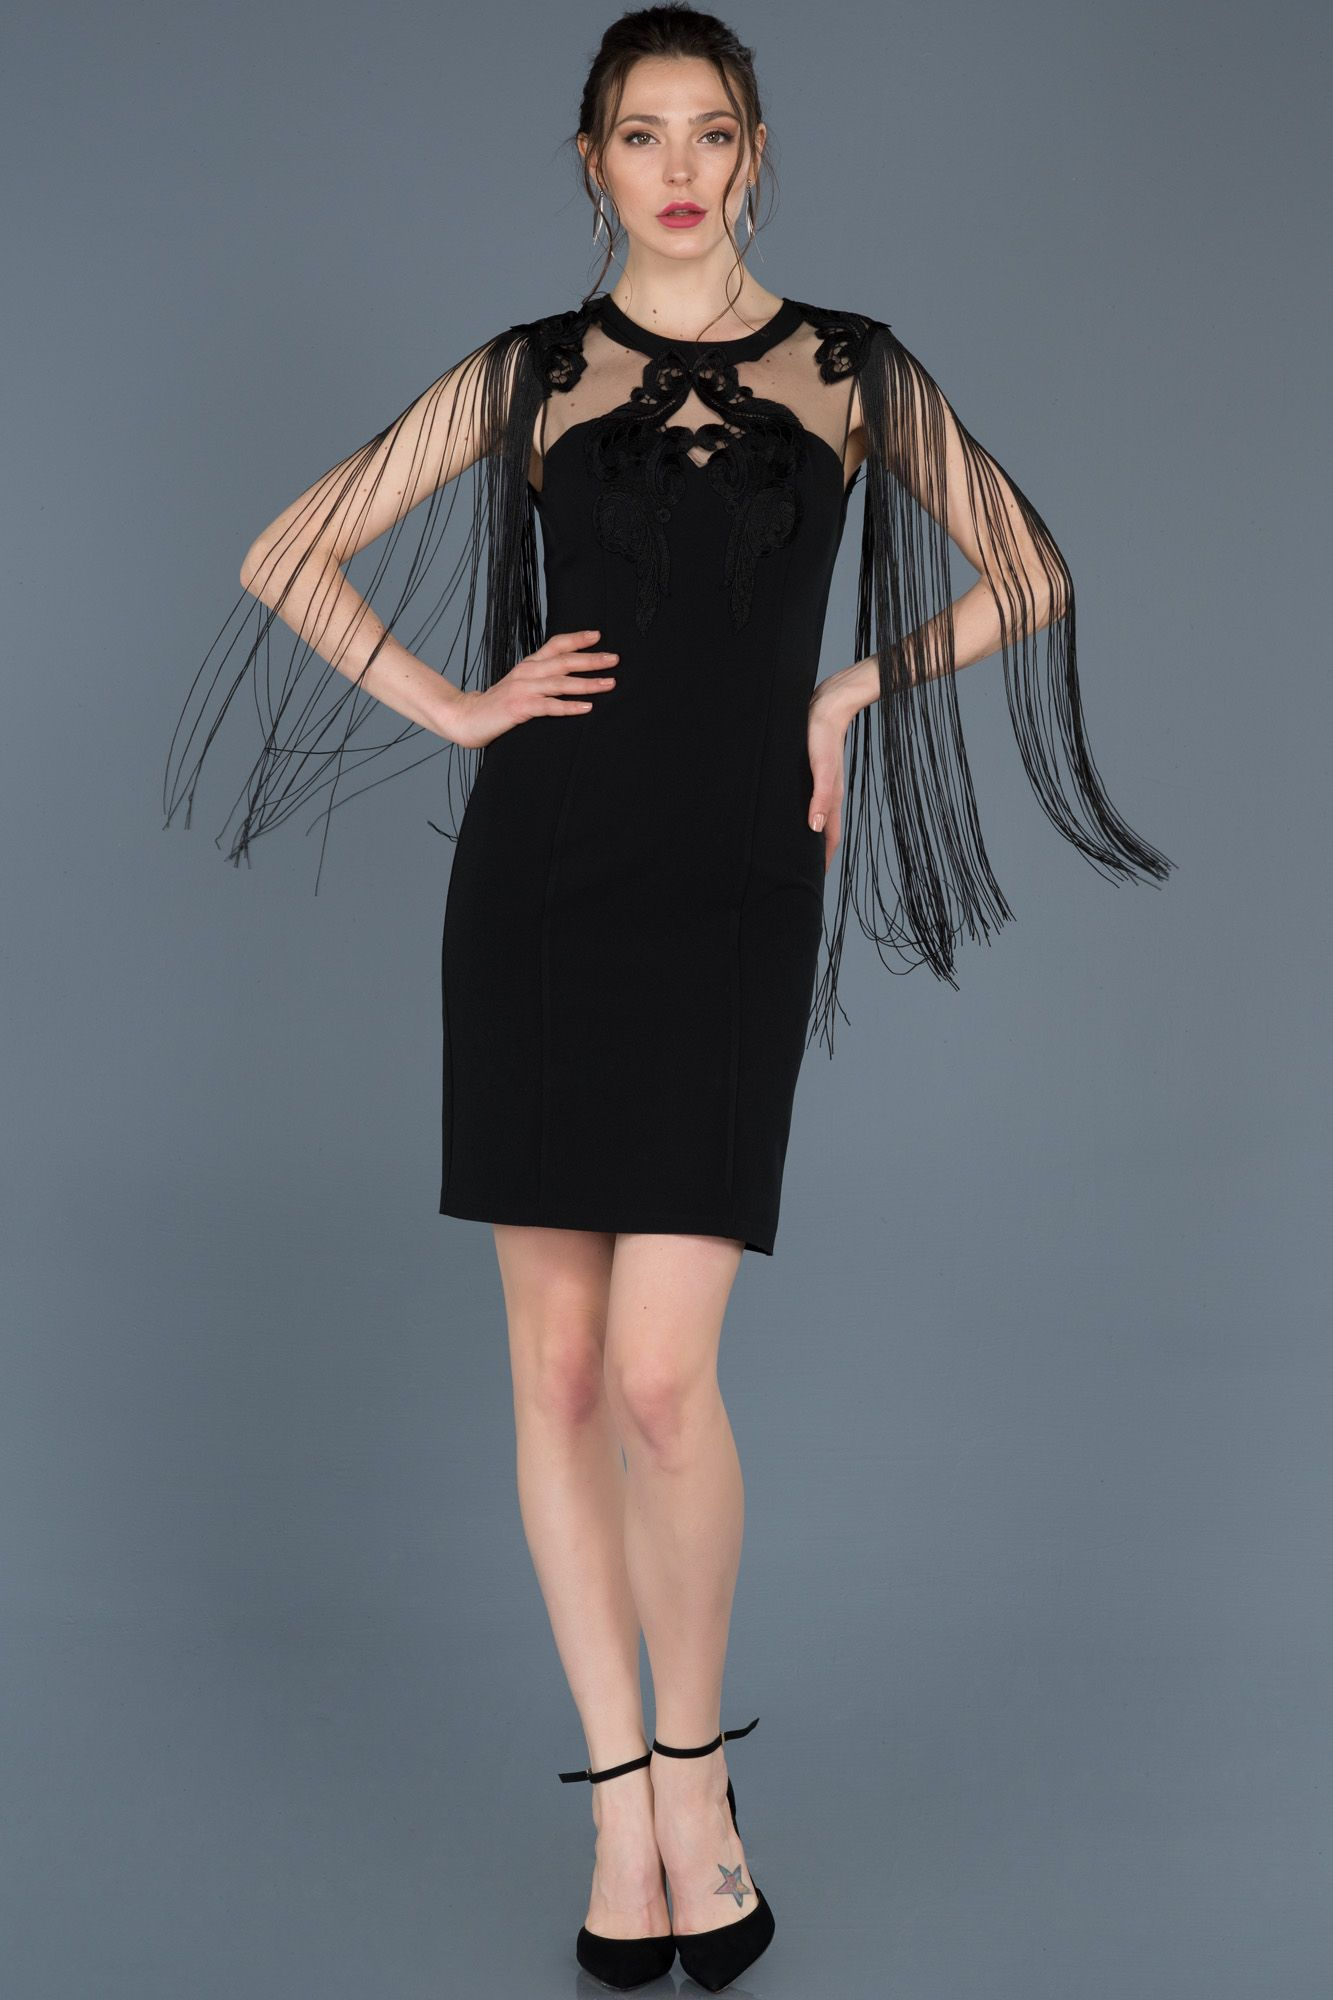 Siyah Kisa Puskullu Davet Elbisesi Abk439 Moda Stilleri Siyah Kisa Elbise Siyah Abiye